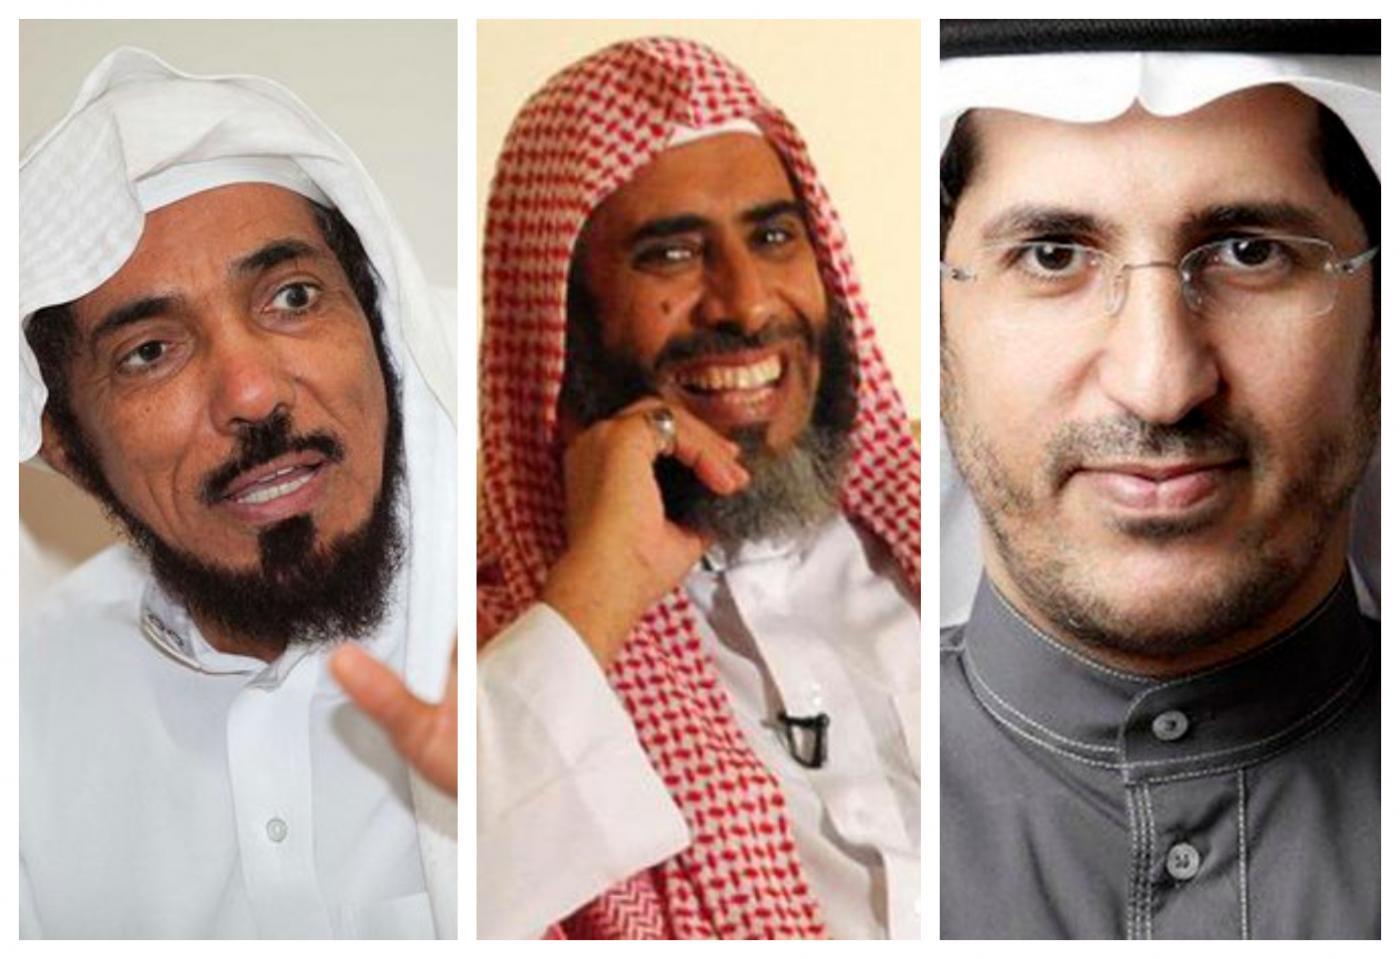 Saudi Arabia To Execute 3 Leading Scholars After Ramzan